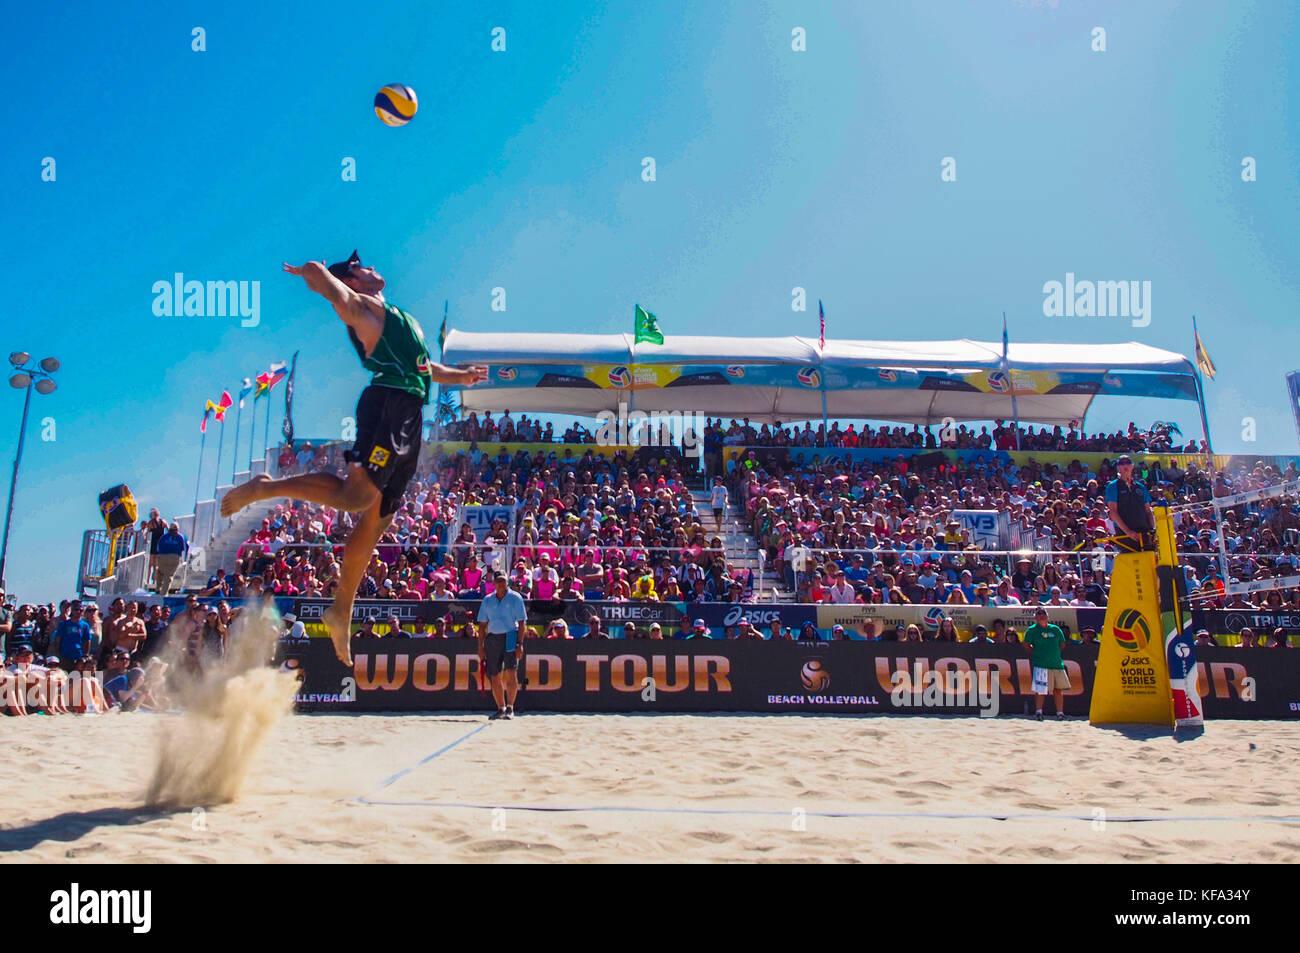 asics 2015 volleyball